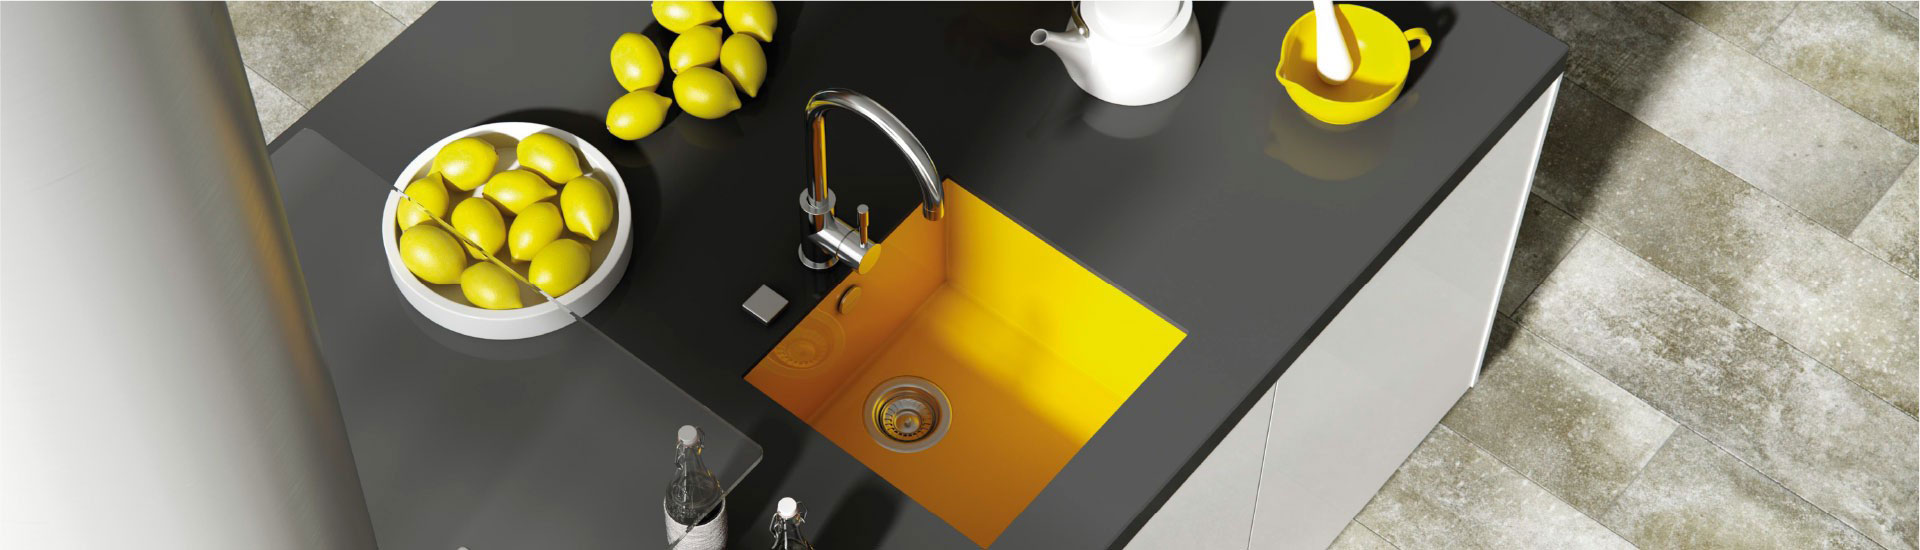 fregaderos sintéticos para cocina de color amarillo